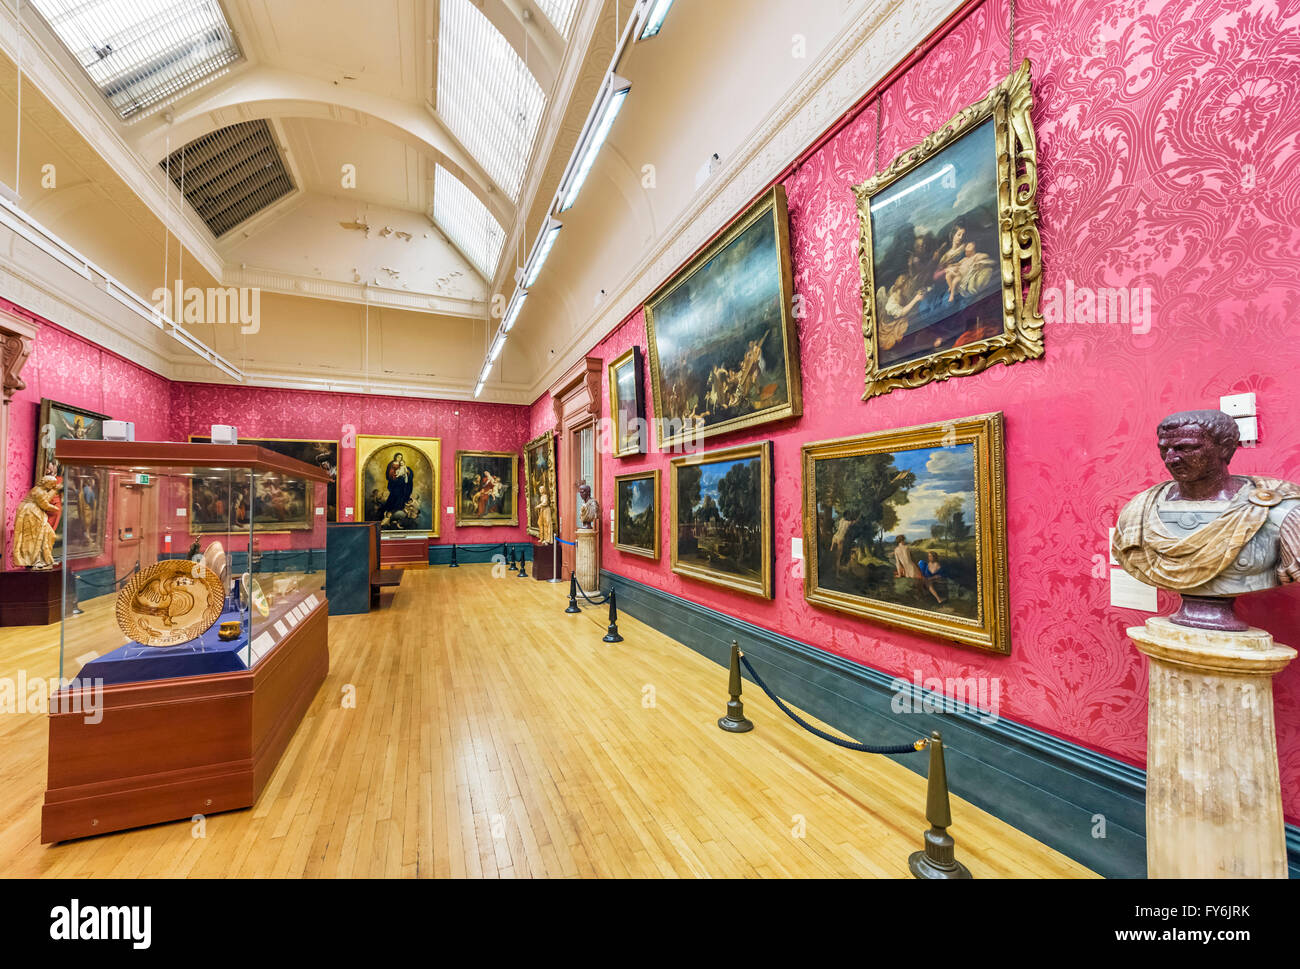 Interior of the Walker Art Gallery, Liverpool, England, UK - Stock Image